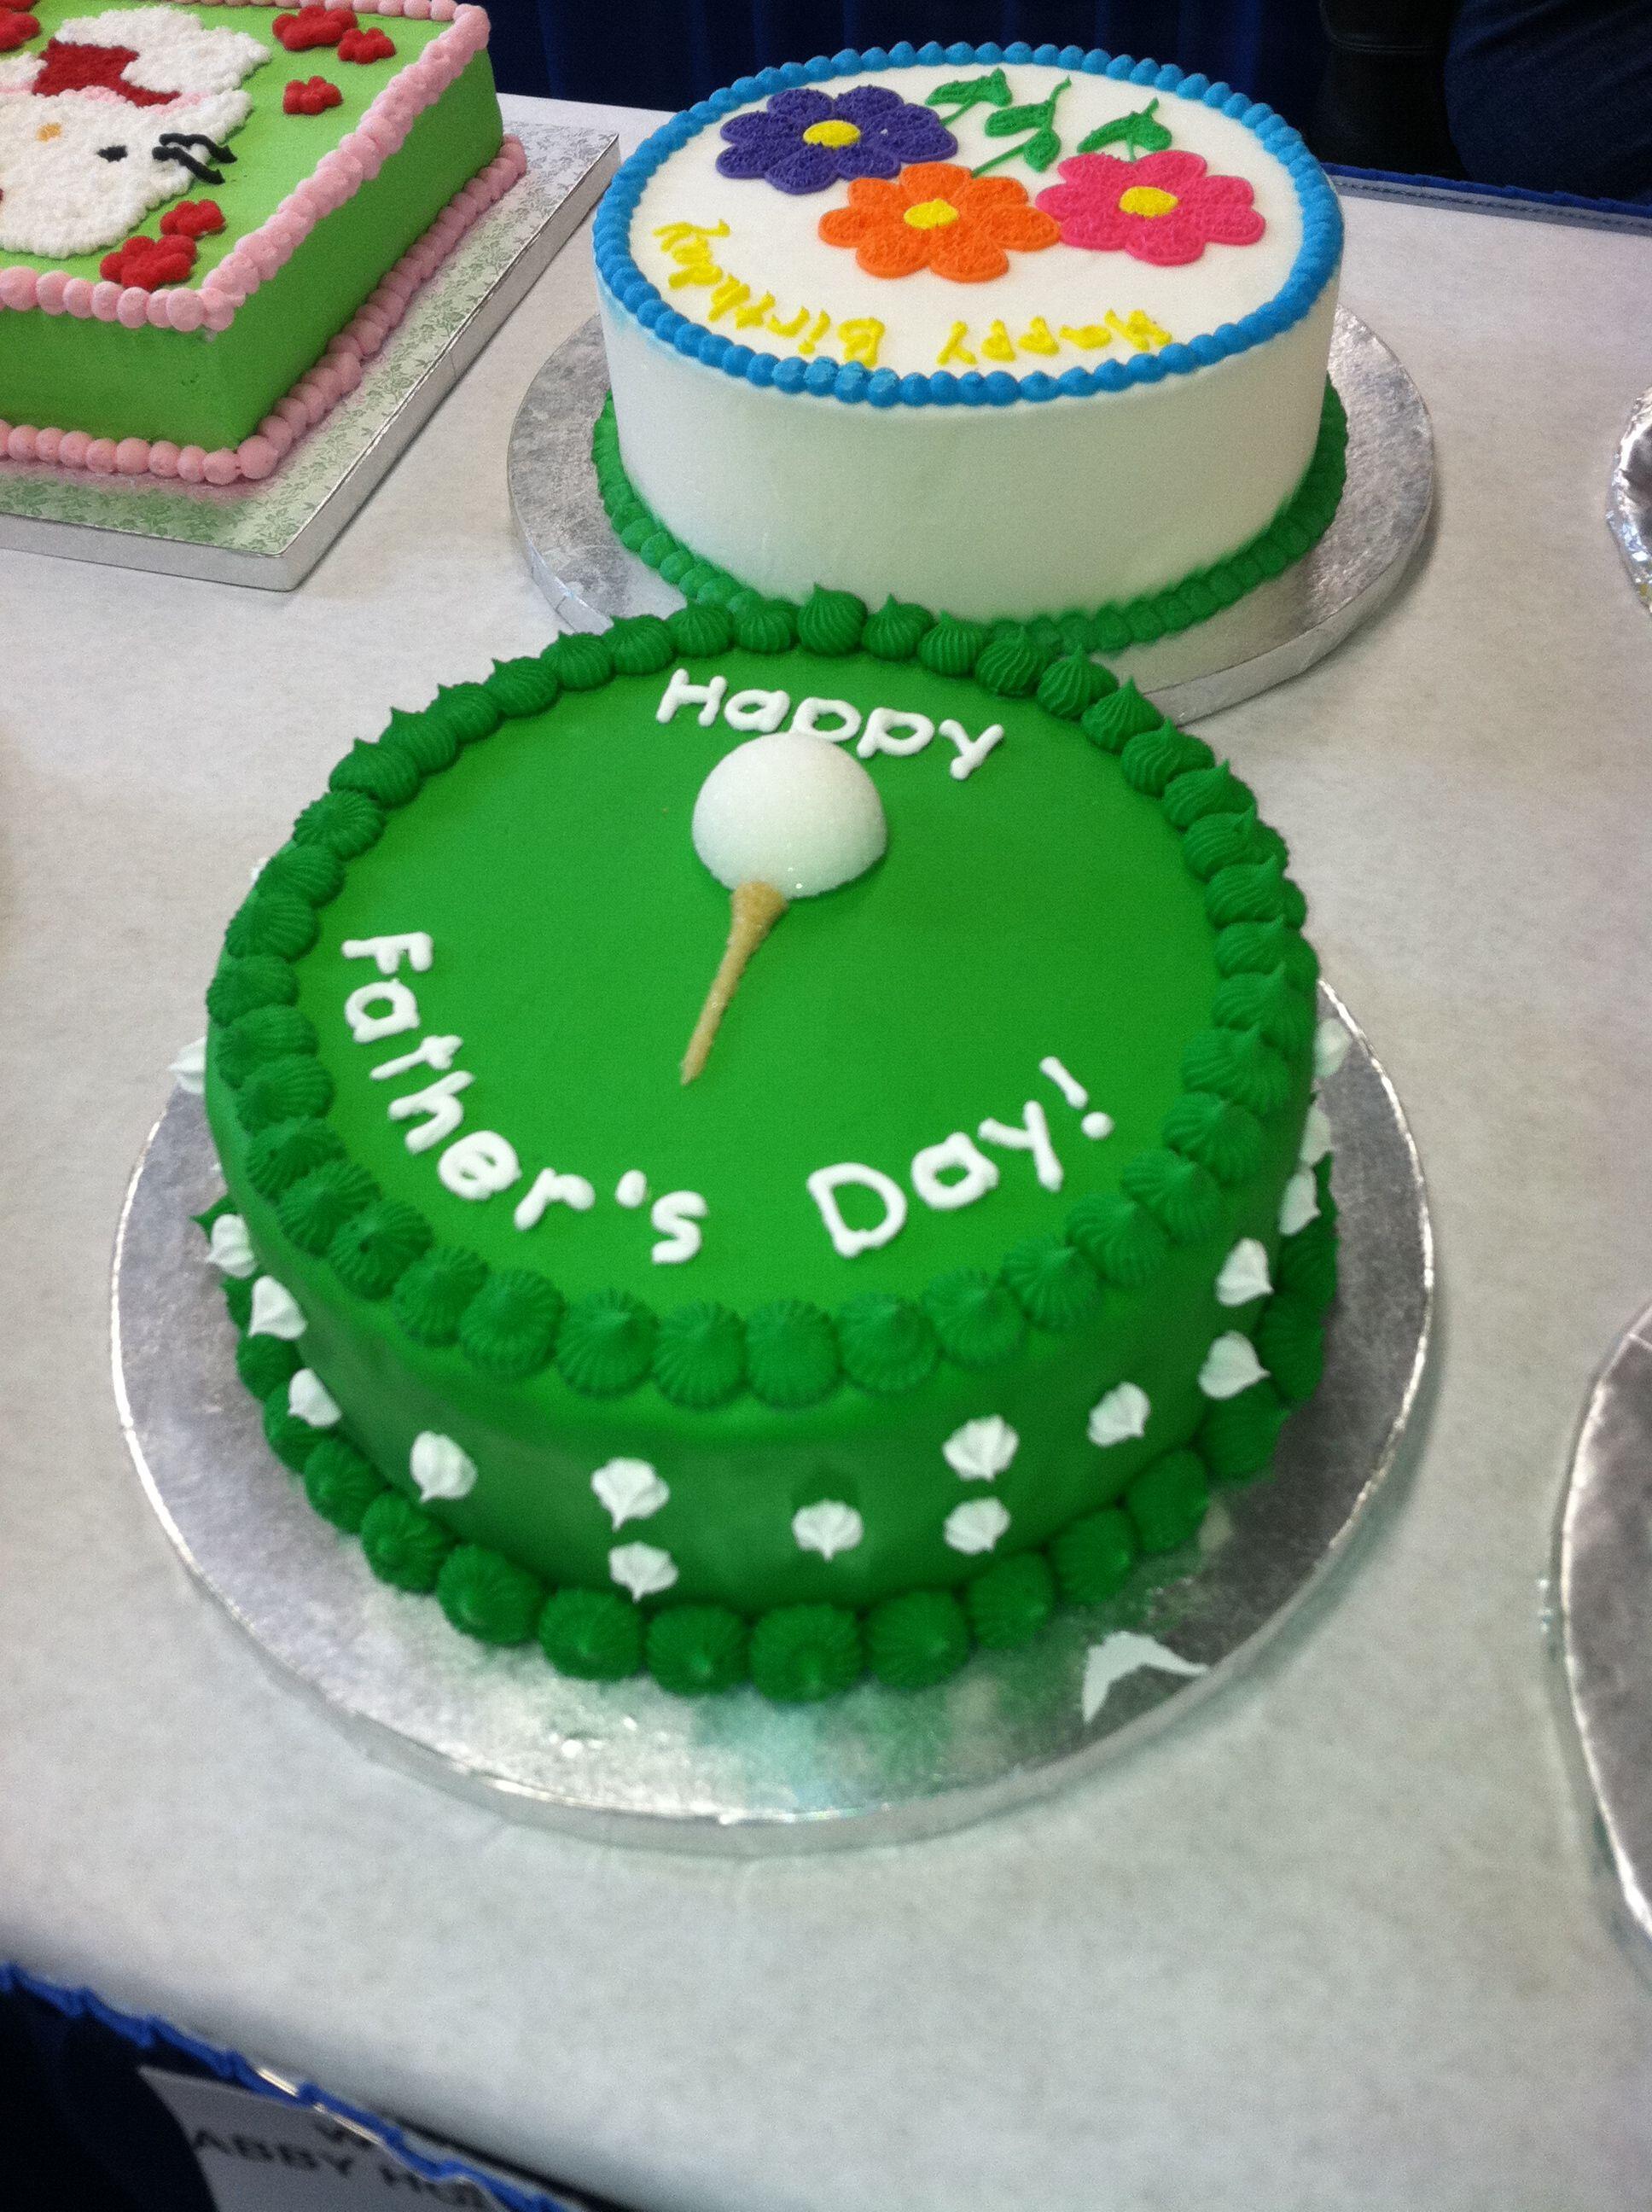 Indiana State Fair 2011 4 h Cake Decorating | 4 H Cake Decorating